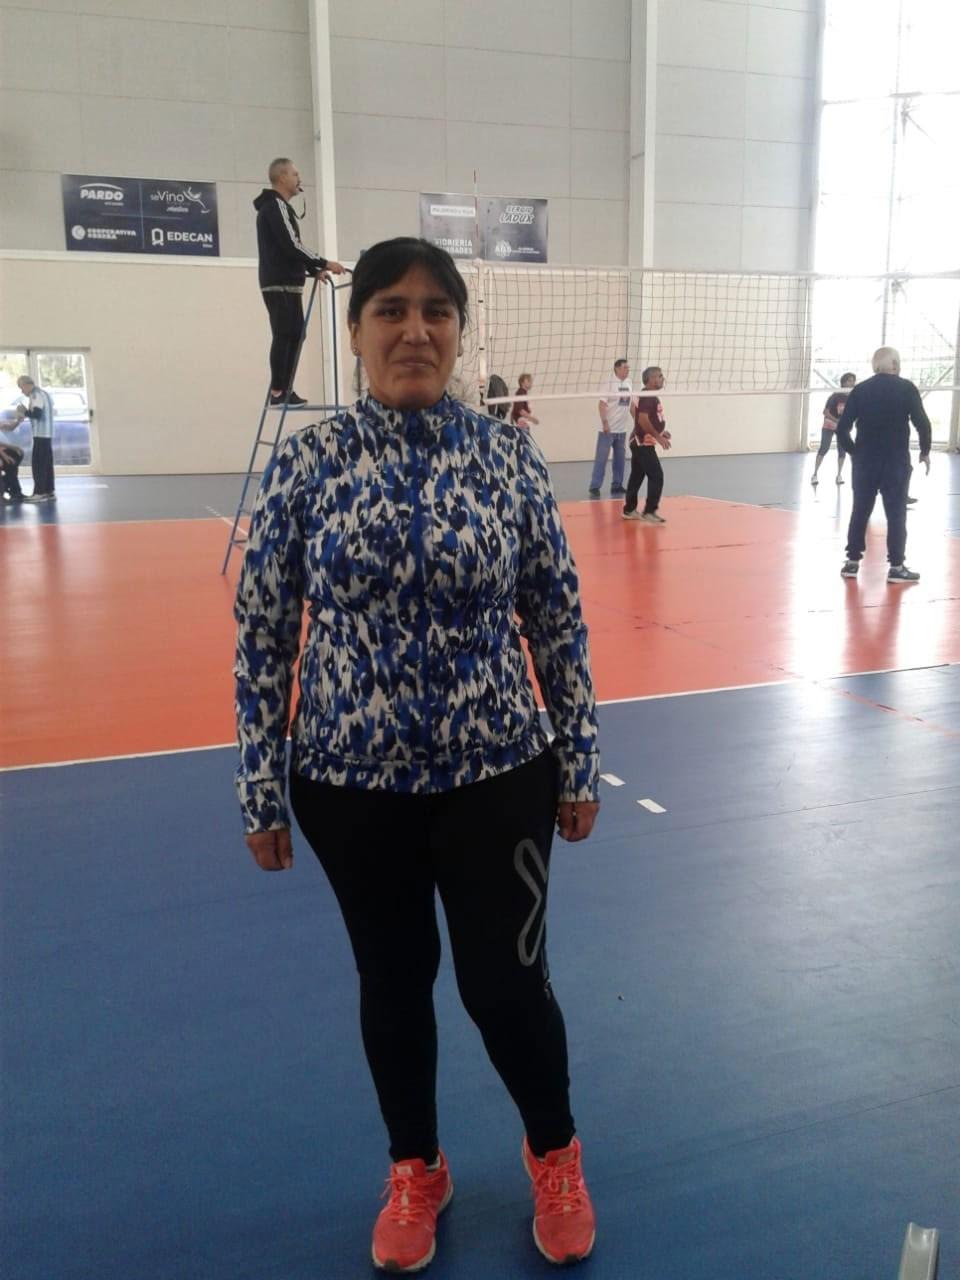 New Com: Una bolivarense es arbitro de vóley adaptado para adultos